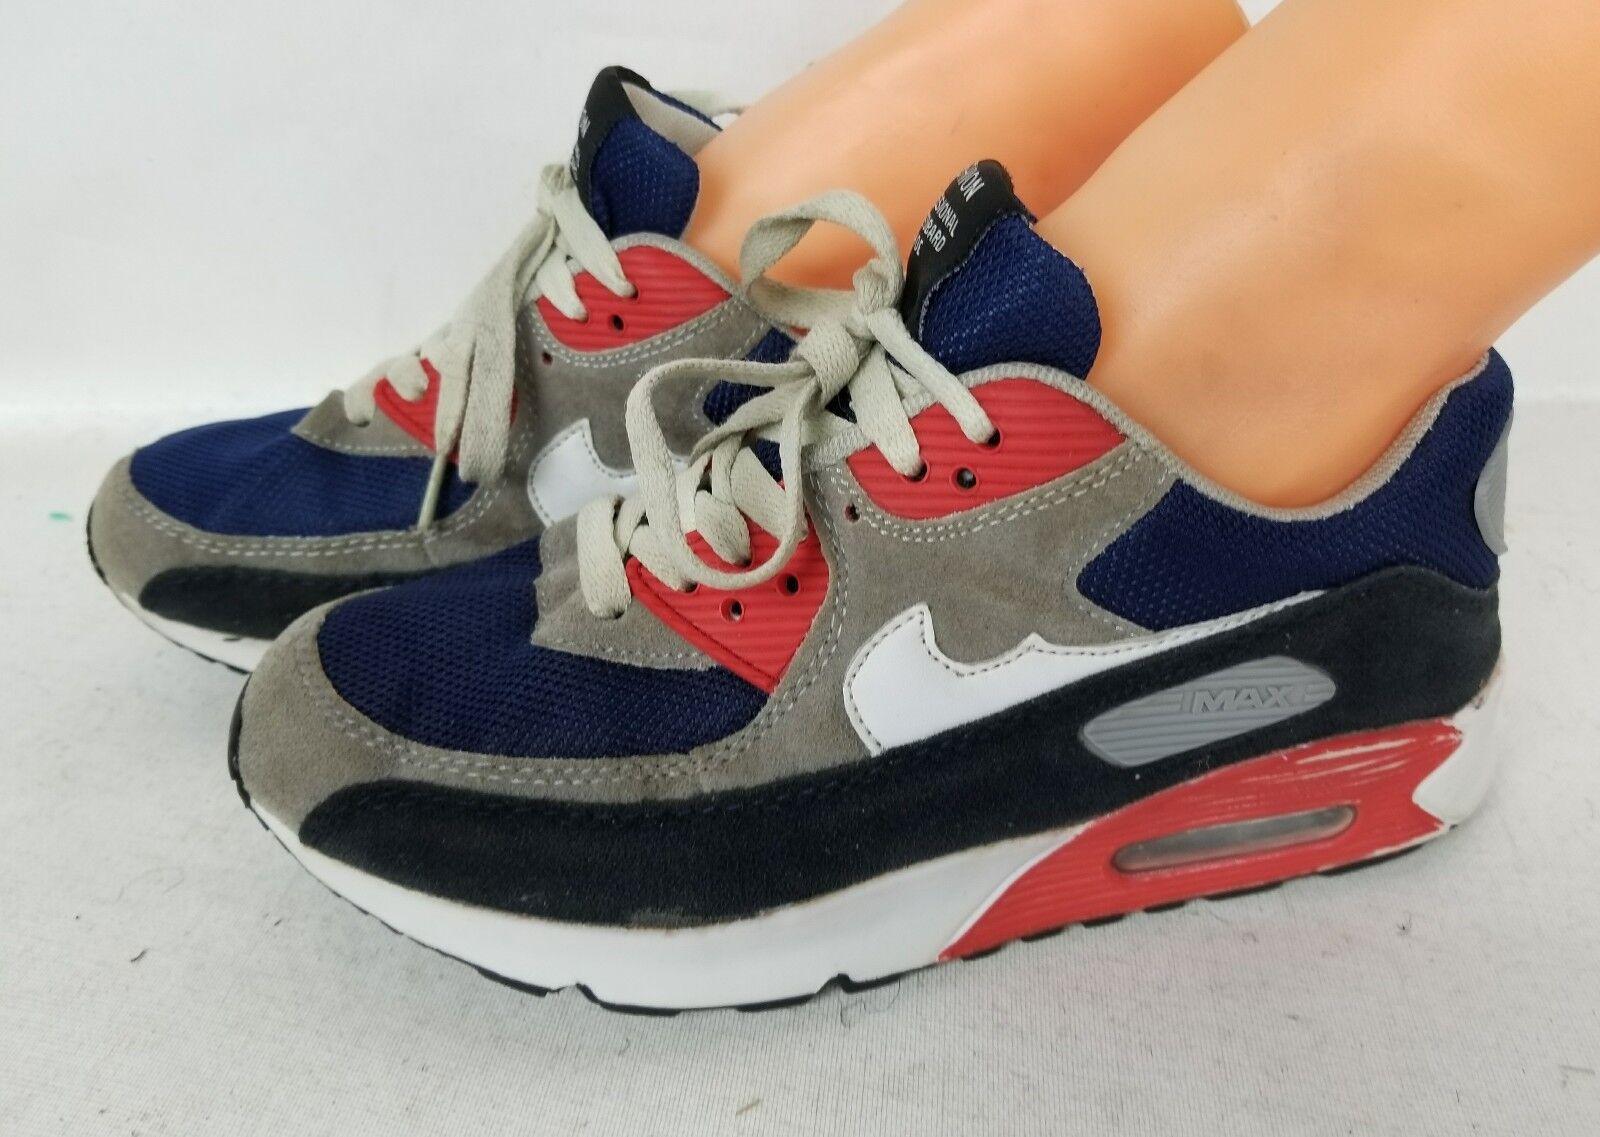 9816e5f1aacf Nike Lunar Hyperworkout Xt Fitness Women s Shoes Size Size Size 9.5 c18aa4  ...